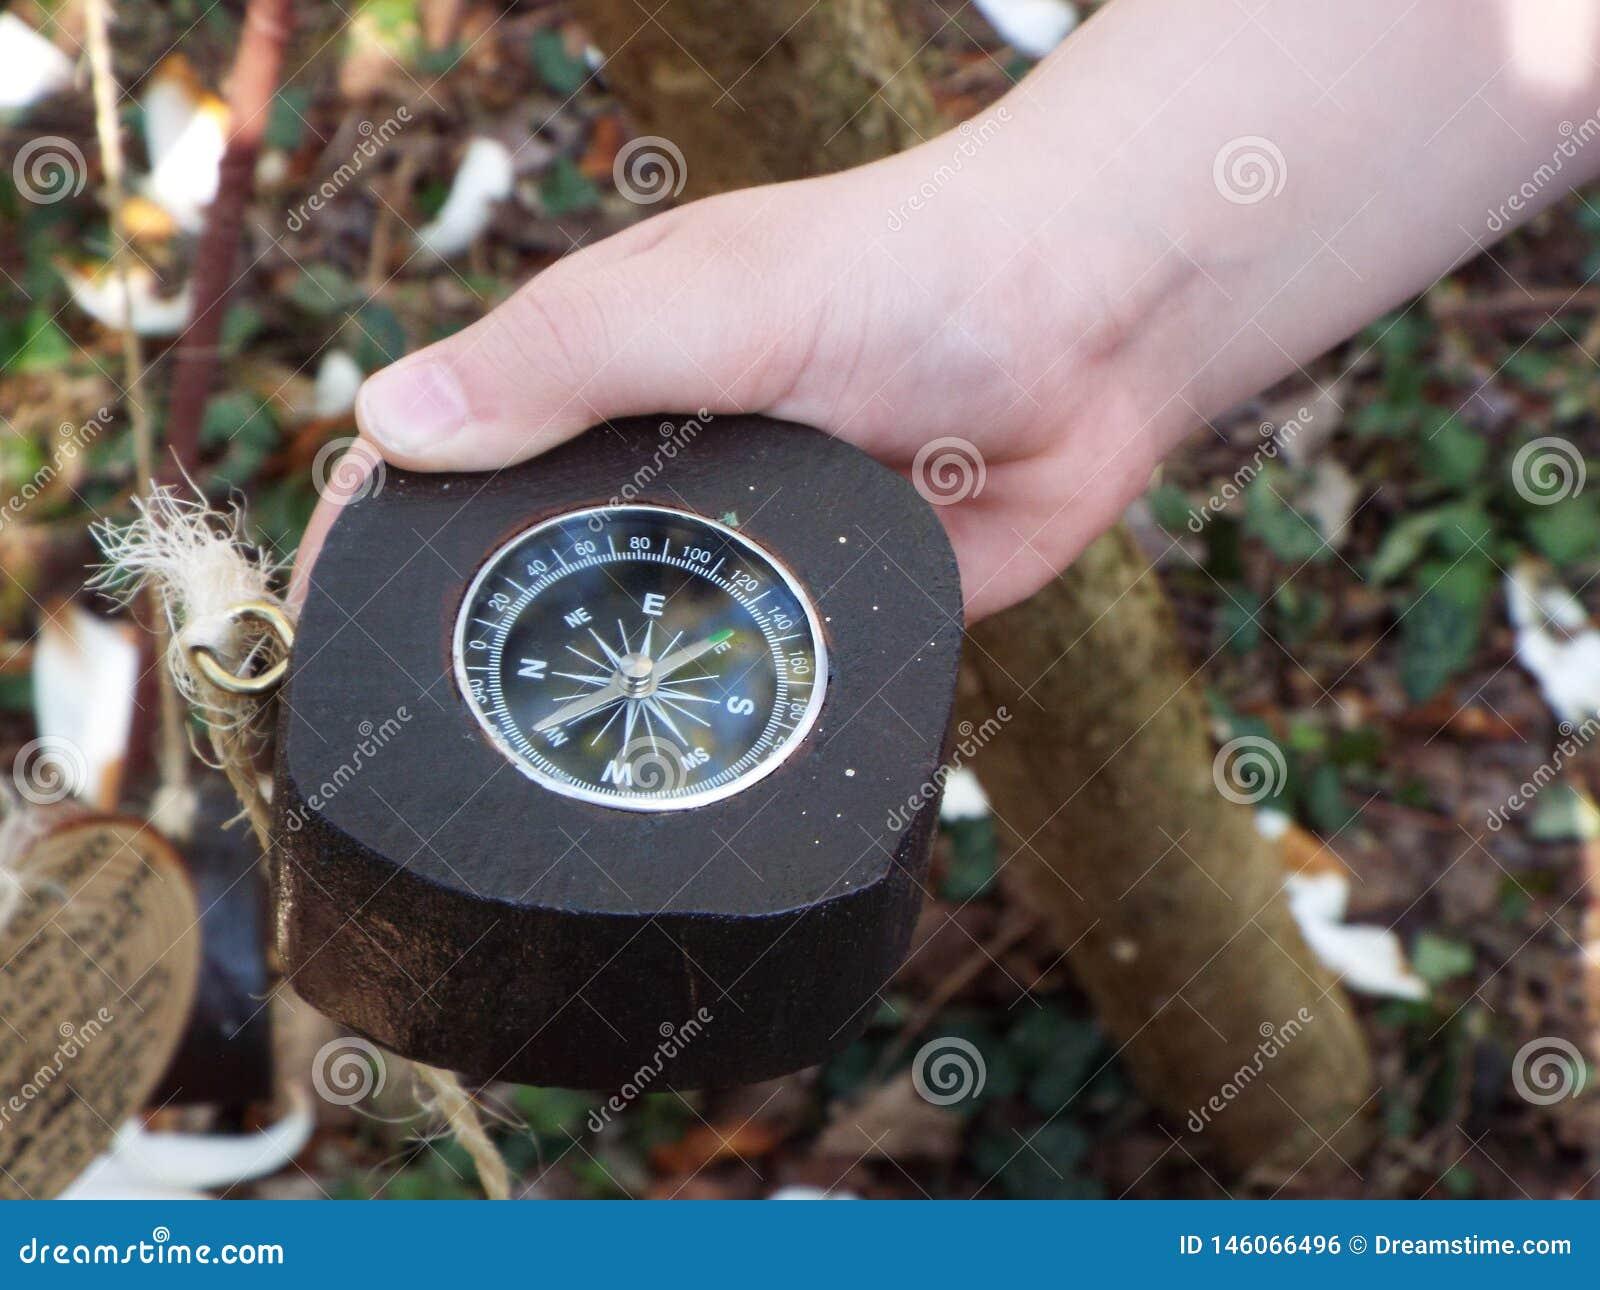 Navigational compass held in hand